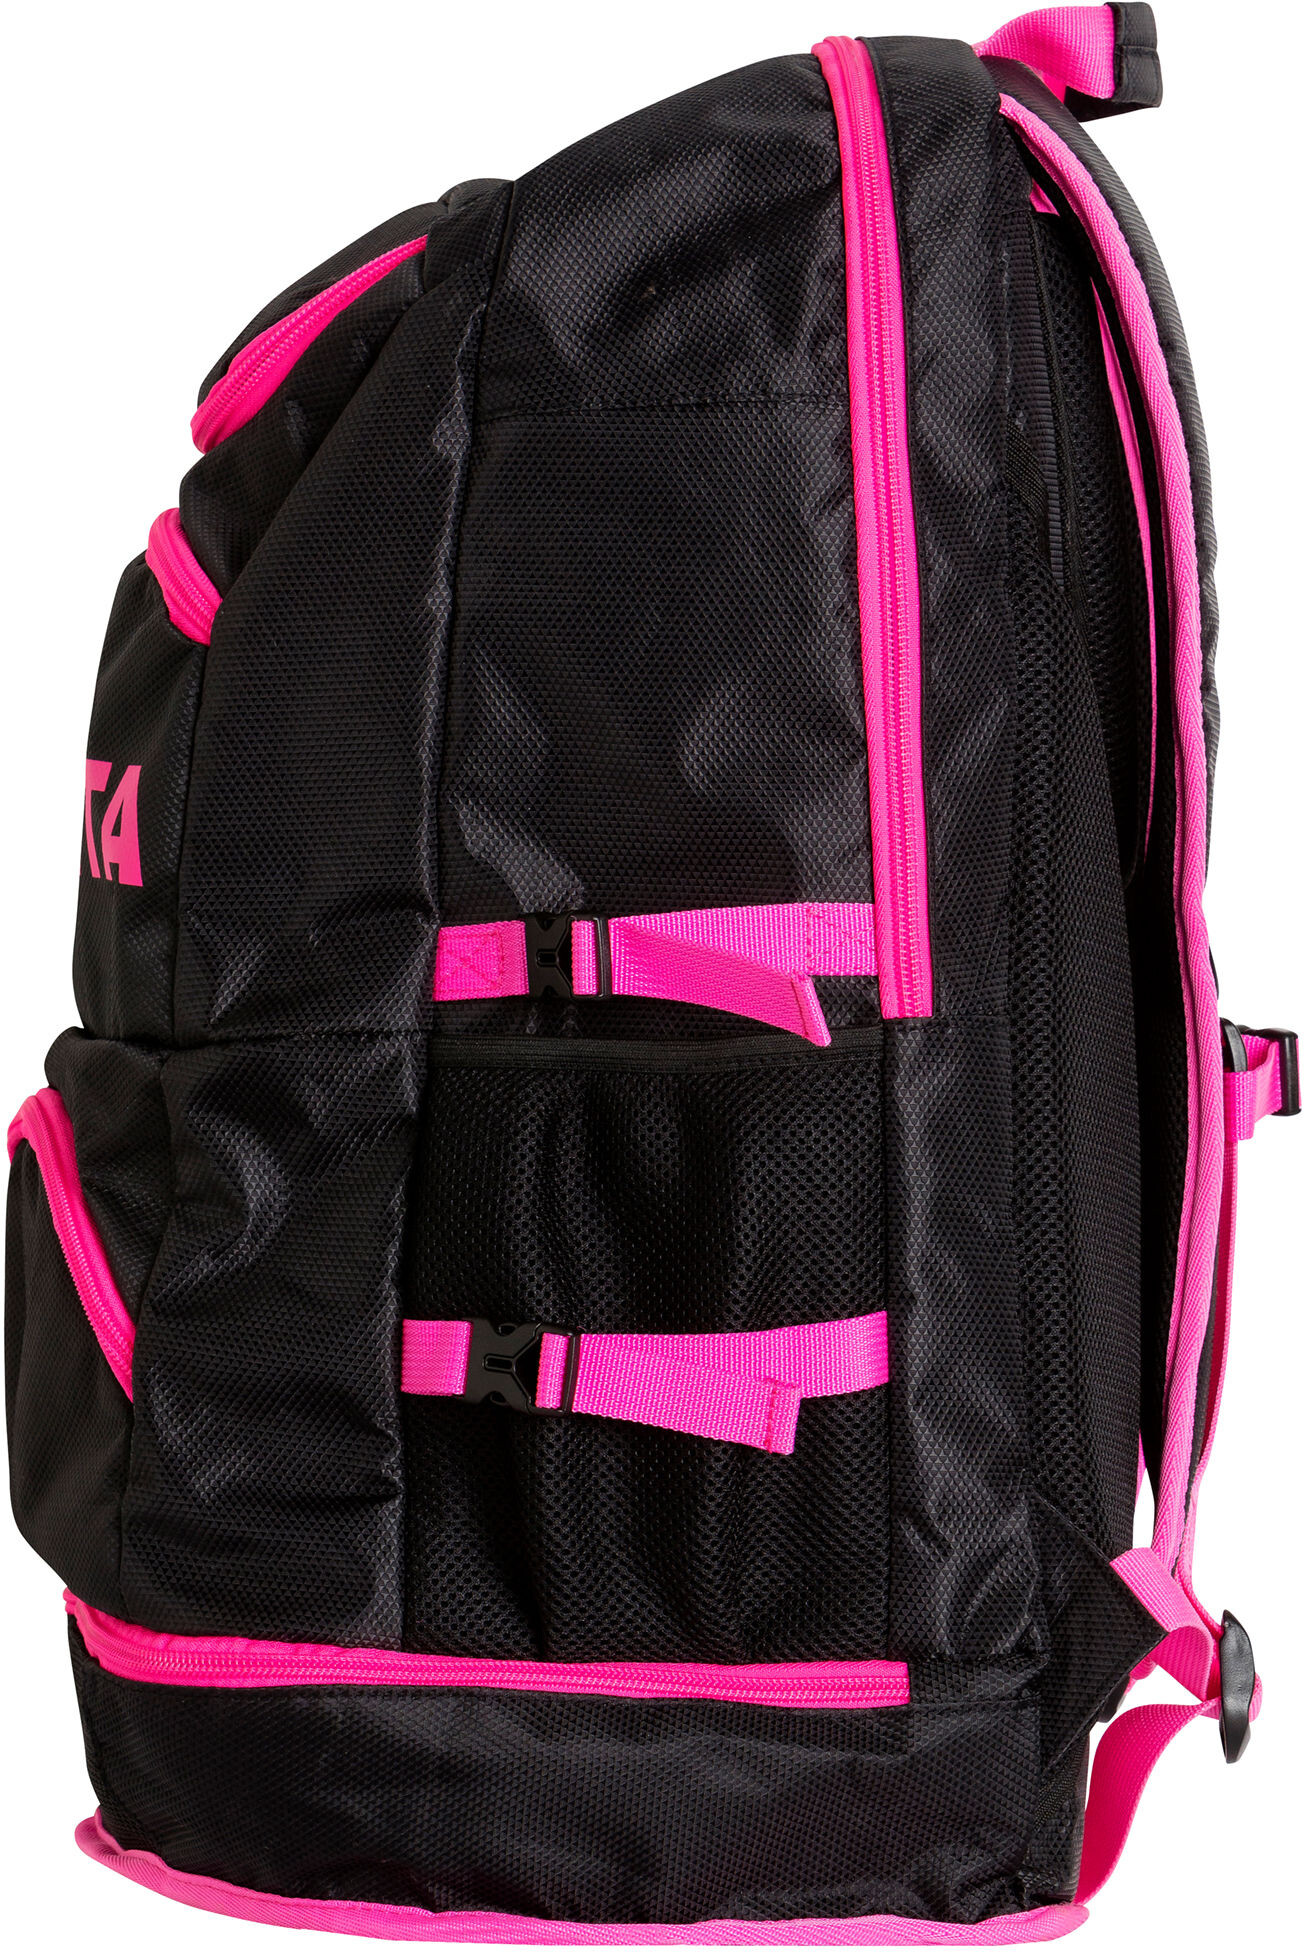 Funkita Elite Squad Swim Backpack Pink Black At Addnature